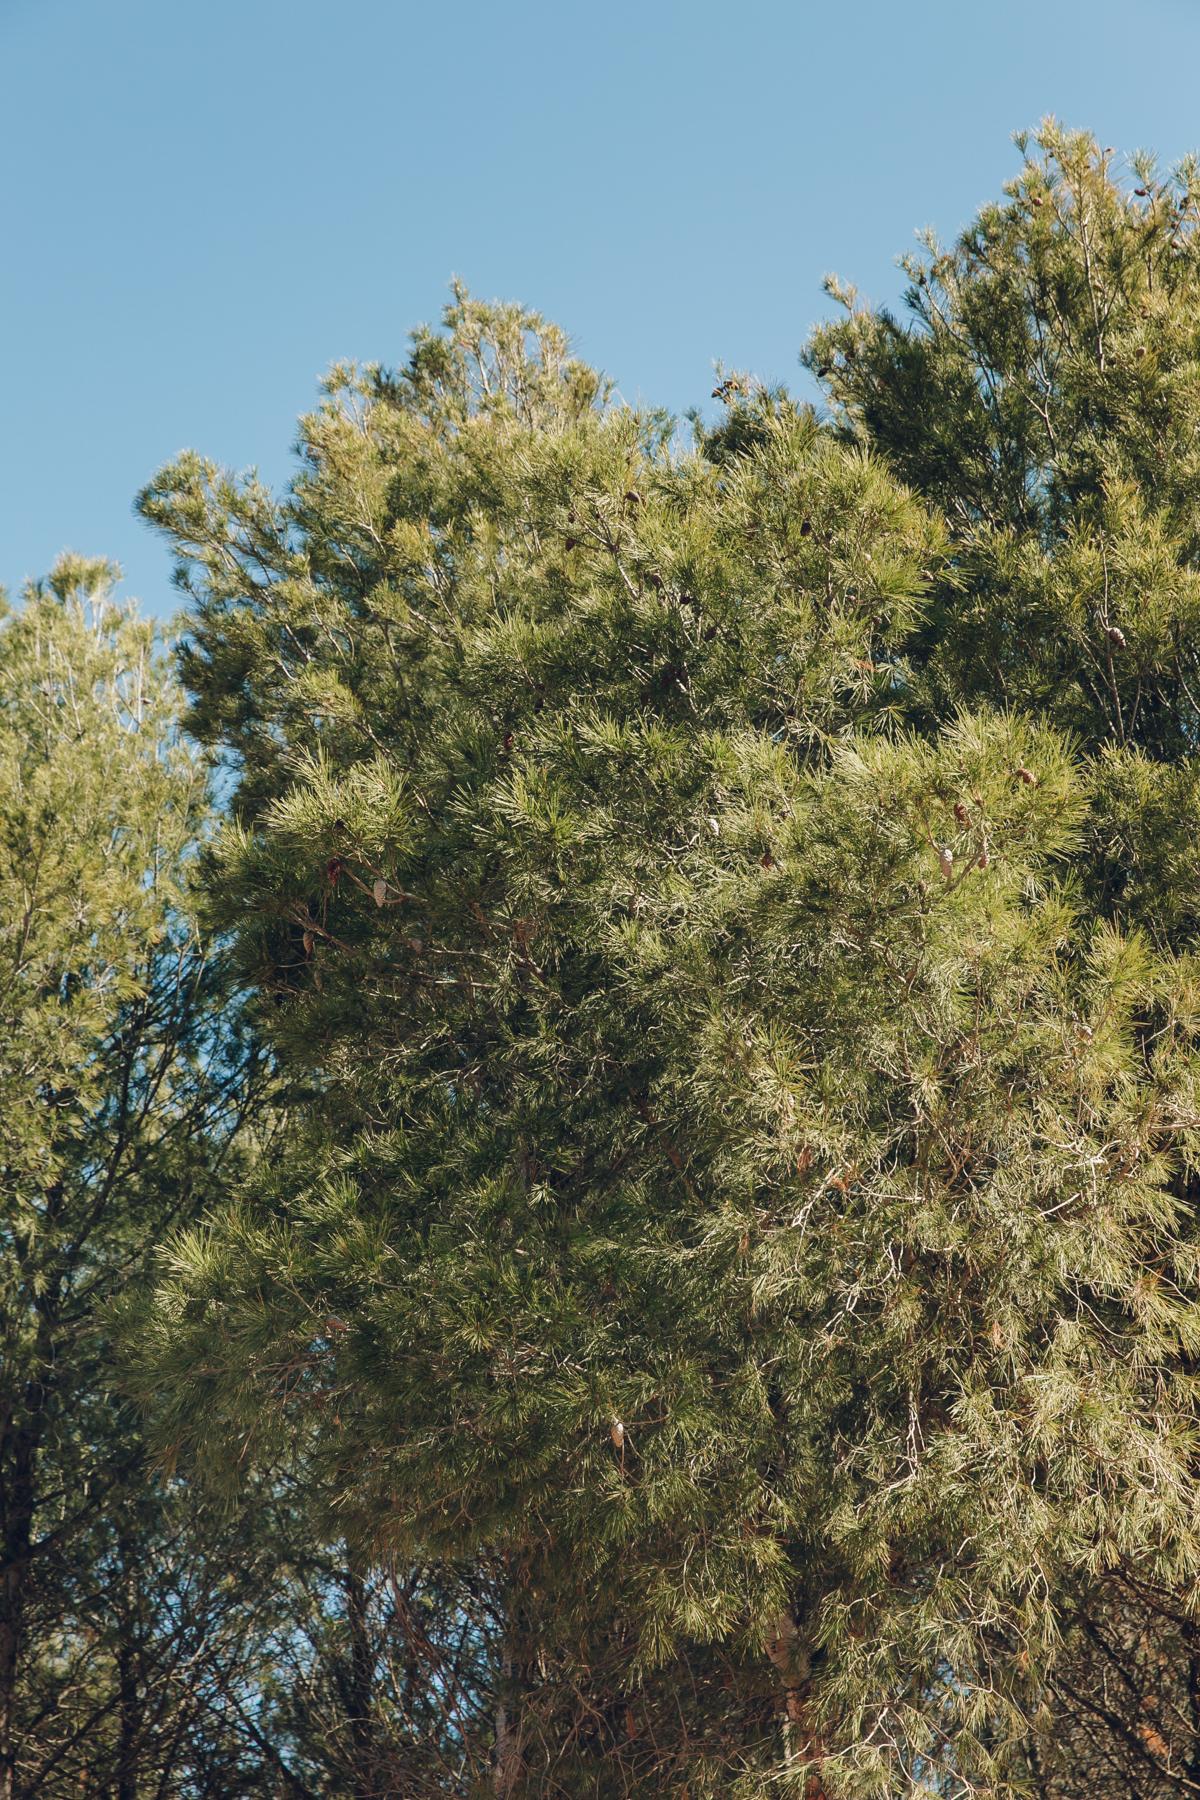 Pine trees on Valdearenas beach in Iznajar, Andalusia.